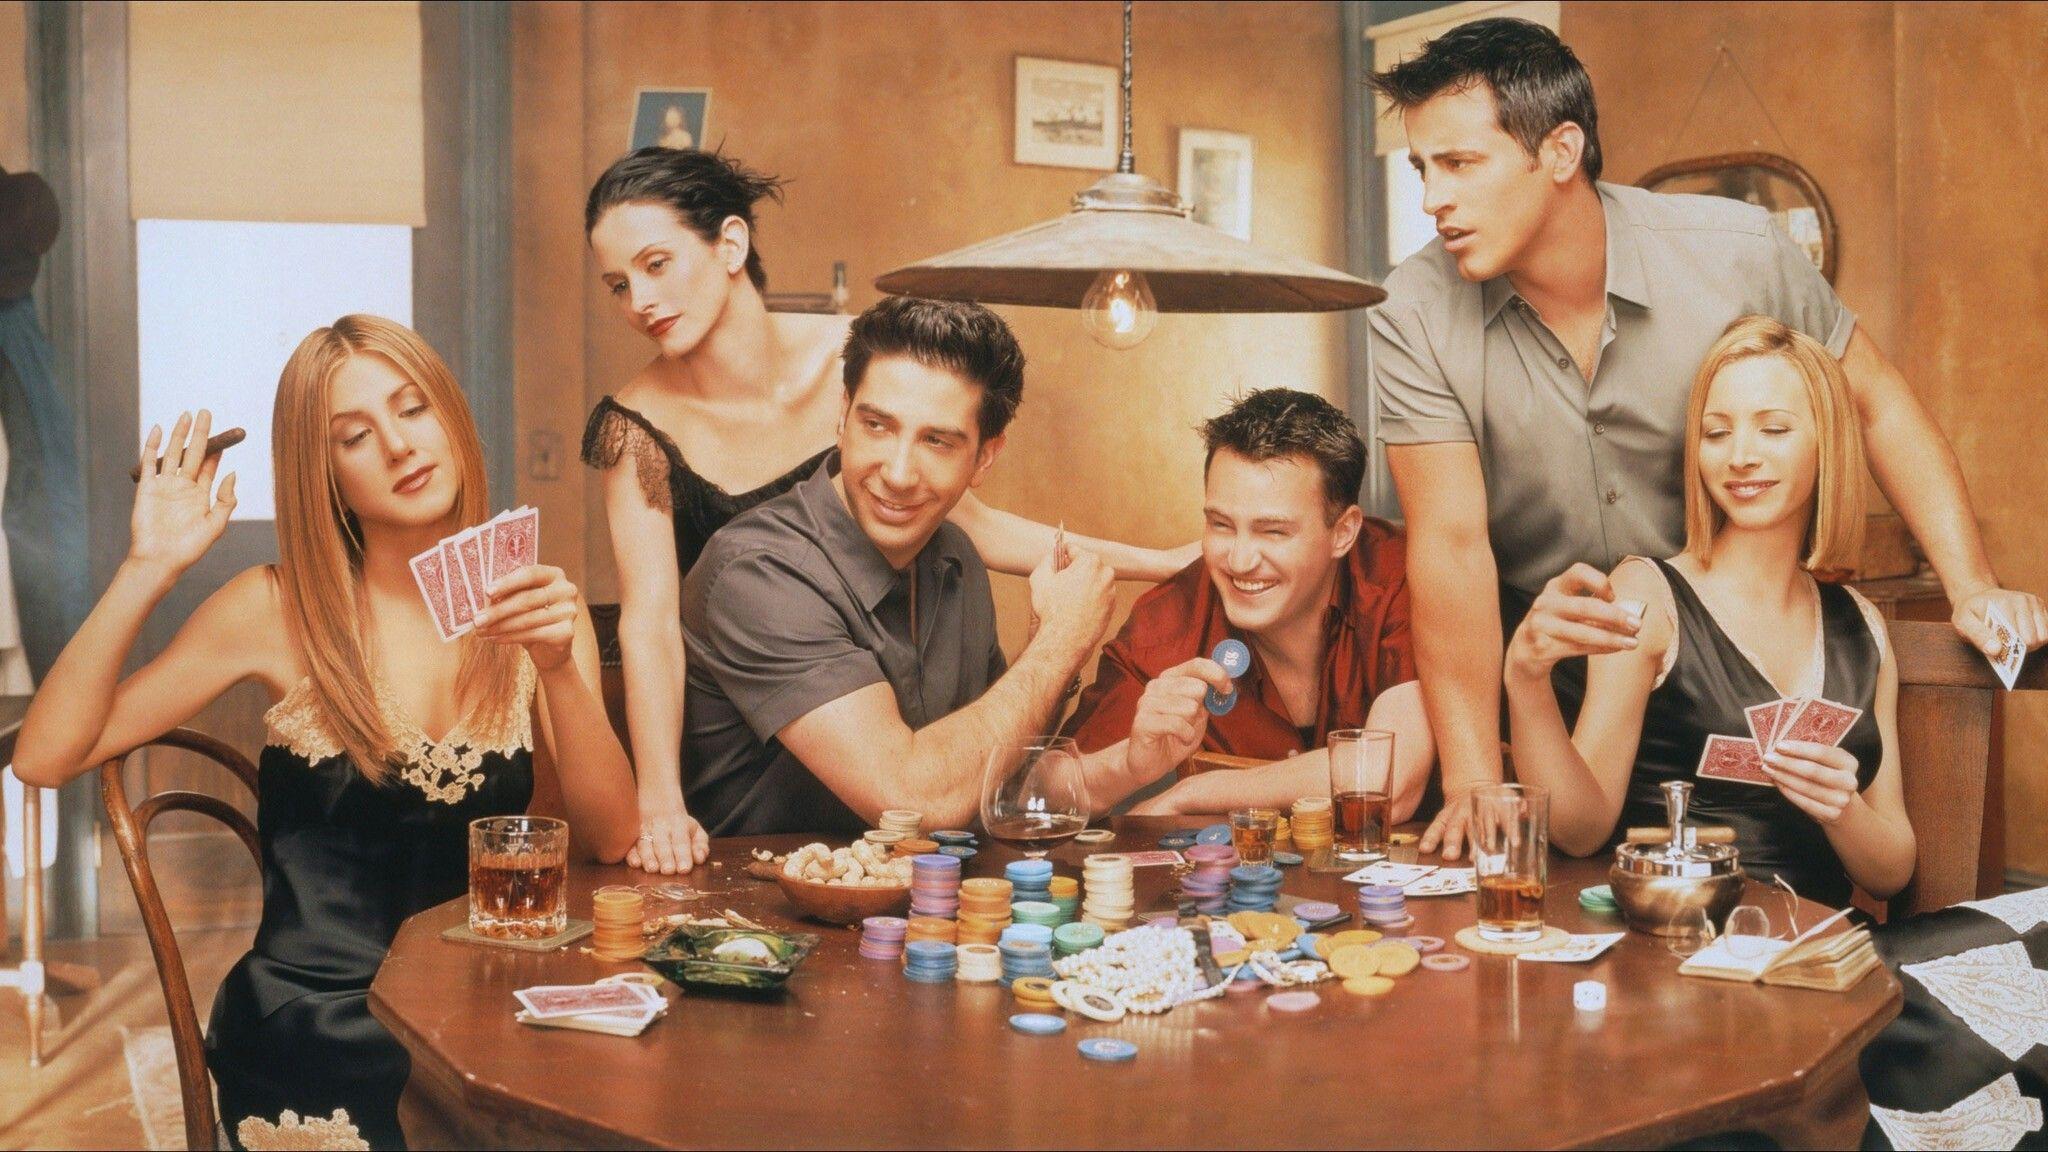 Friends-photoshoot. 1994-2004